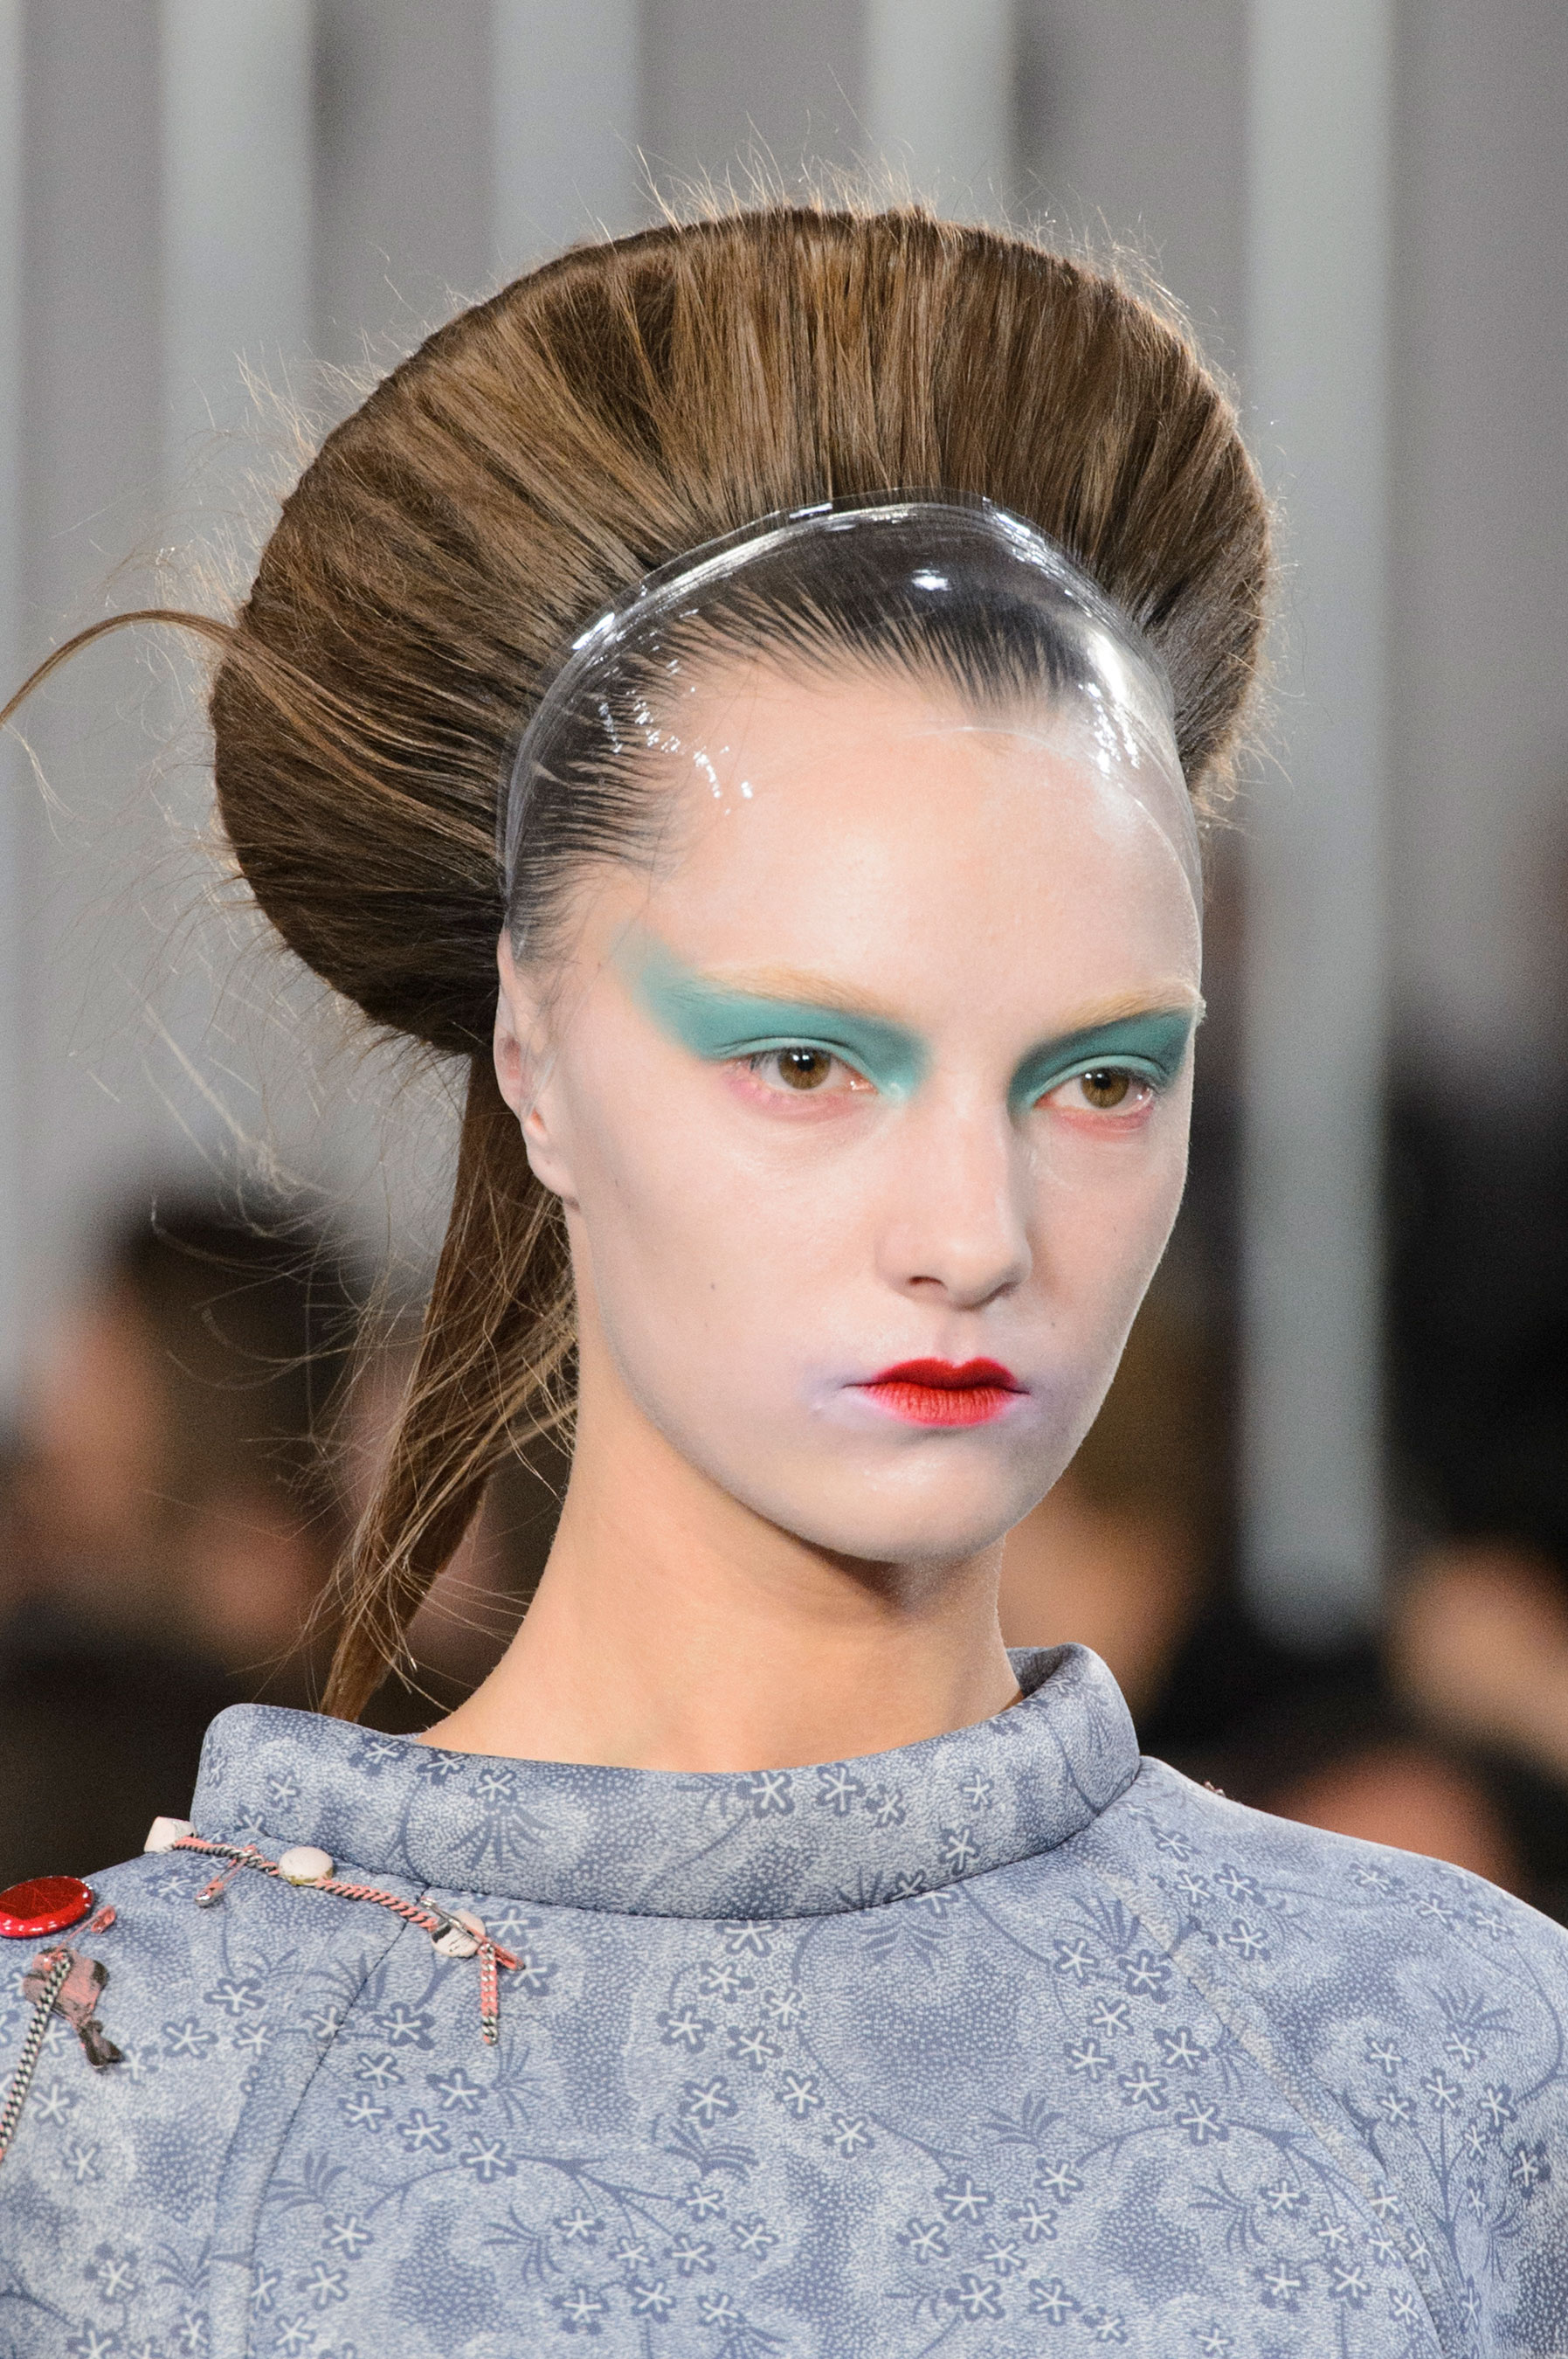 Maison-Margiela-spring-2016-runway-beauty-fashion-show-the-impression-019